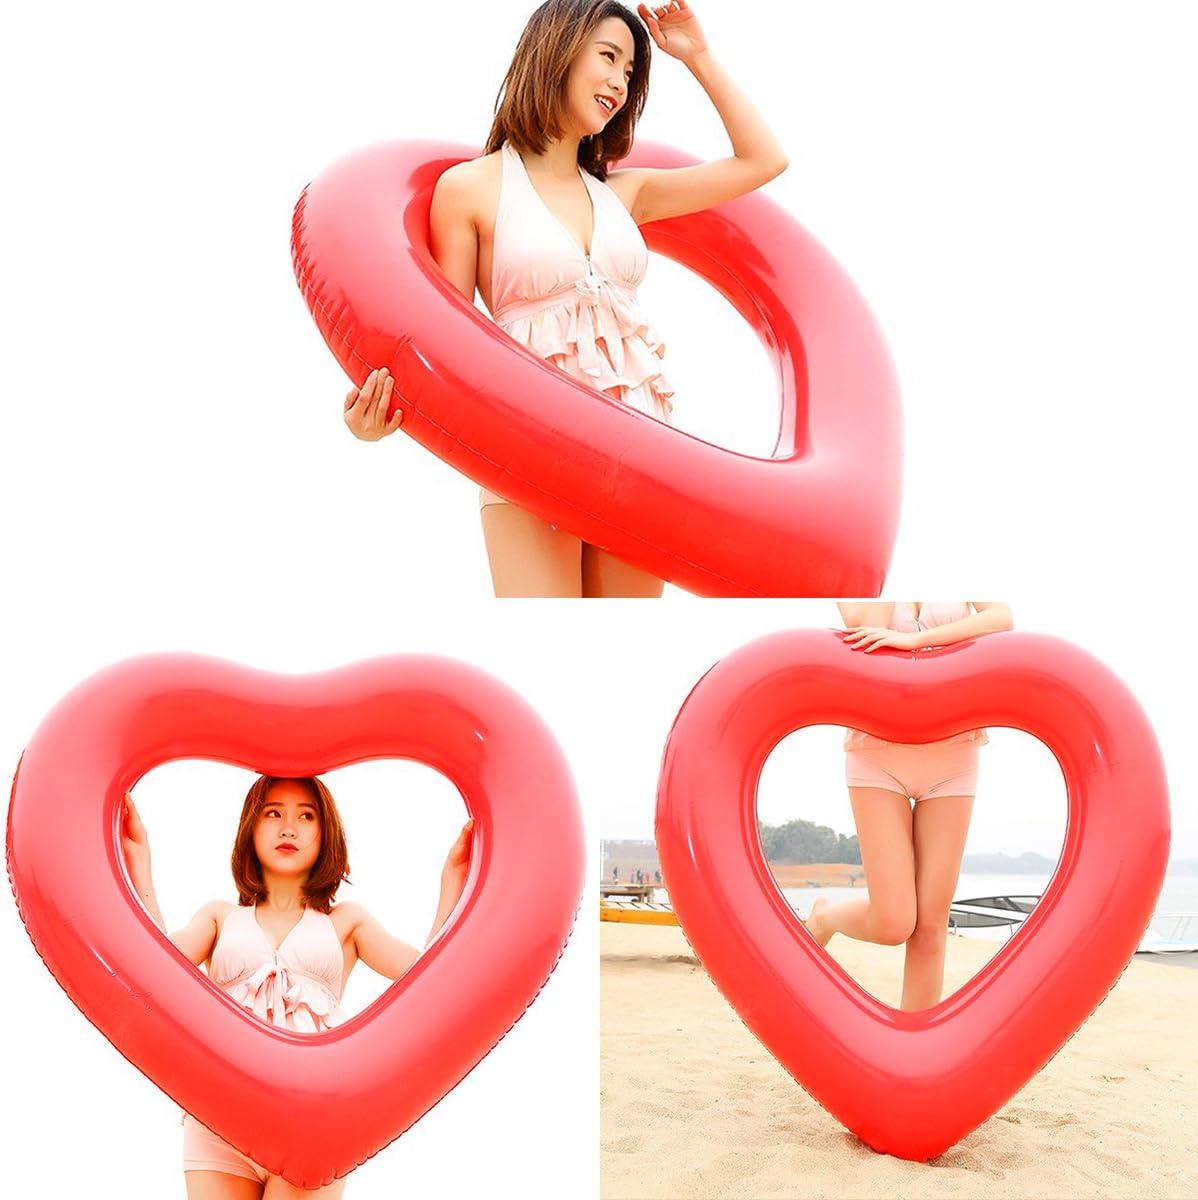 Naisidier Flotador Inflable en Forma de Amor Corazon tamaño Gigante para la Piscina o Playa,Labios Flotador Hinchable para la Piscina o la Playa